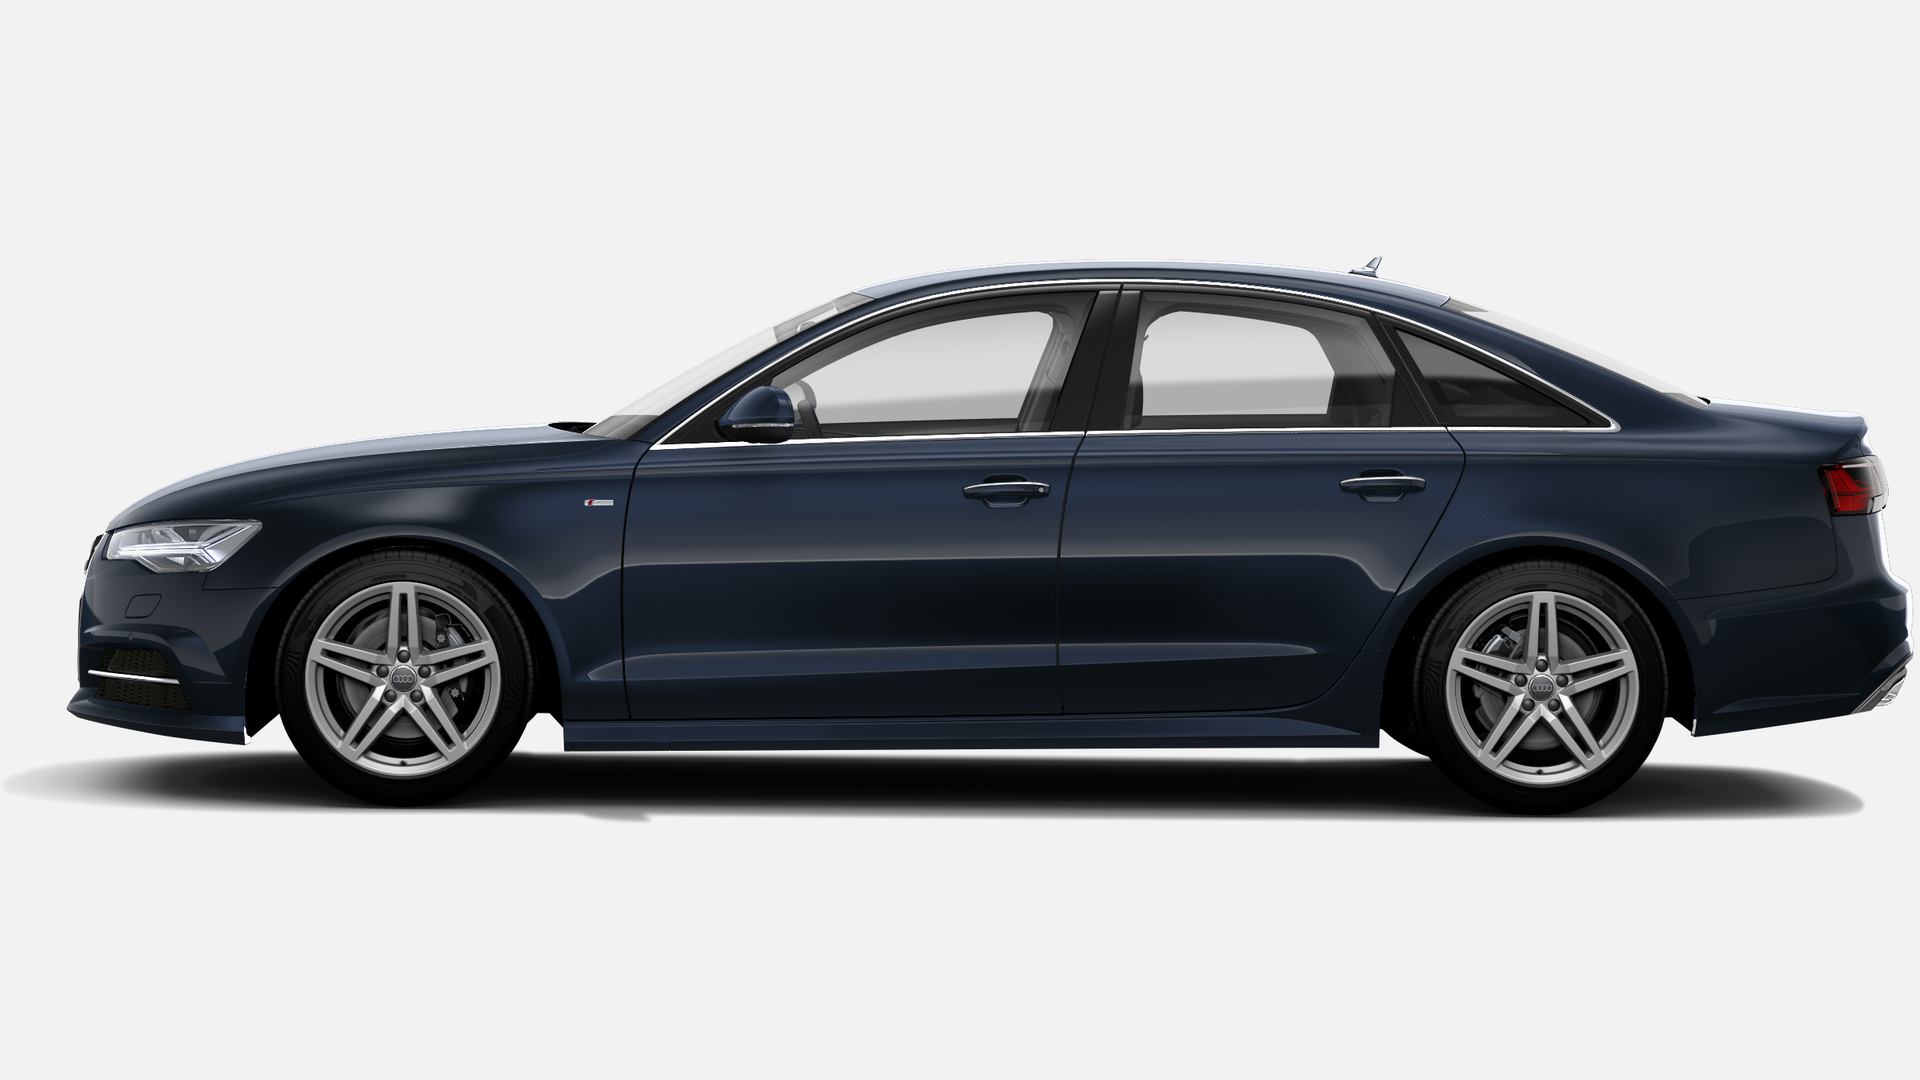 Vista Lateral izquierda de Audi A6 2.0 TDI S line edition S tronic 140 kW (190 CV)